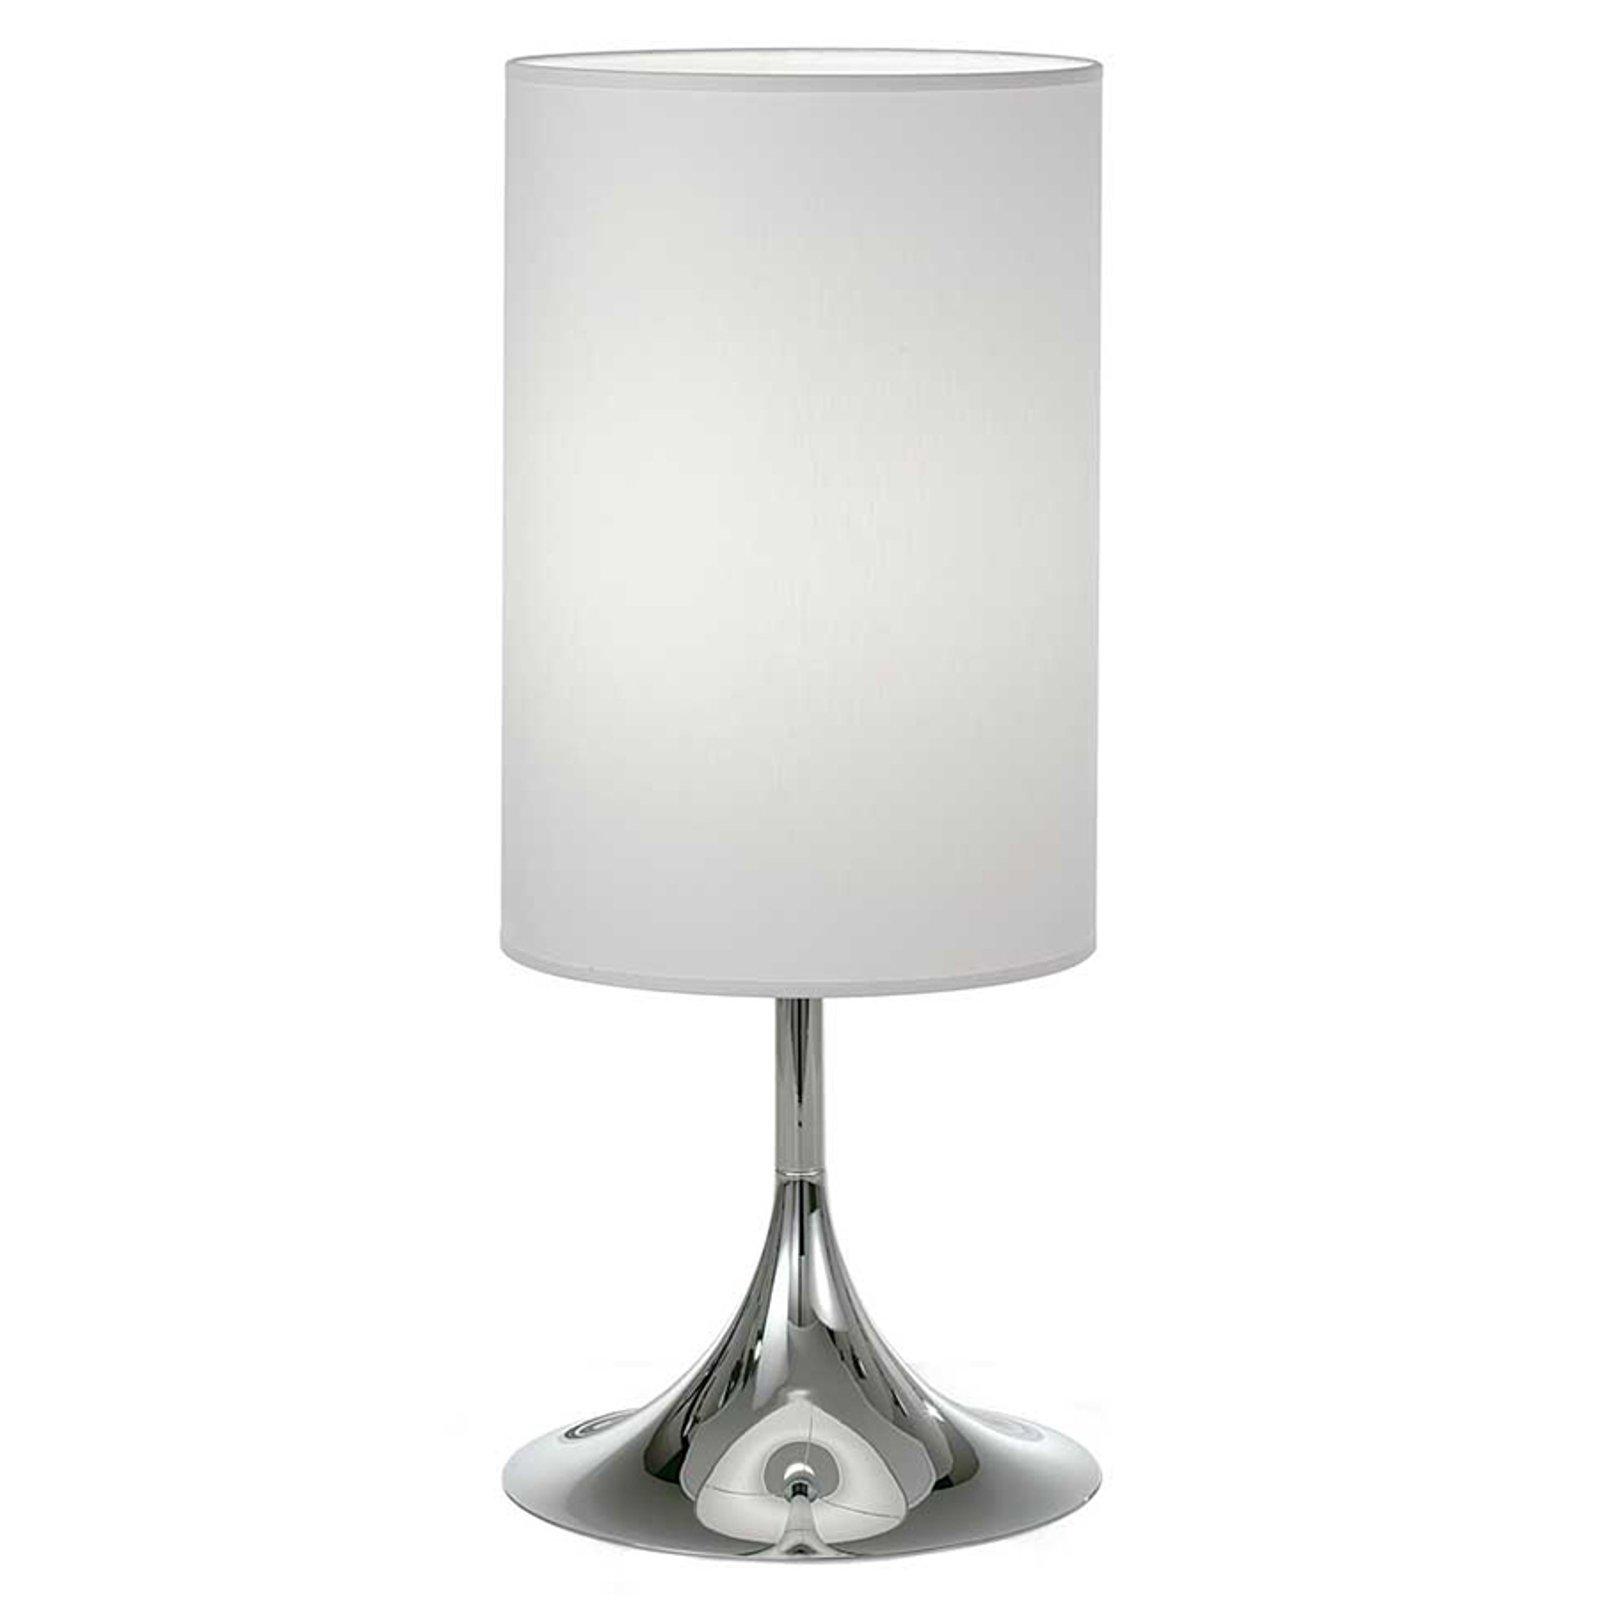 Flute bordlampe hvit krom 55 cm